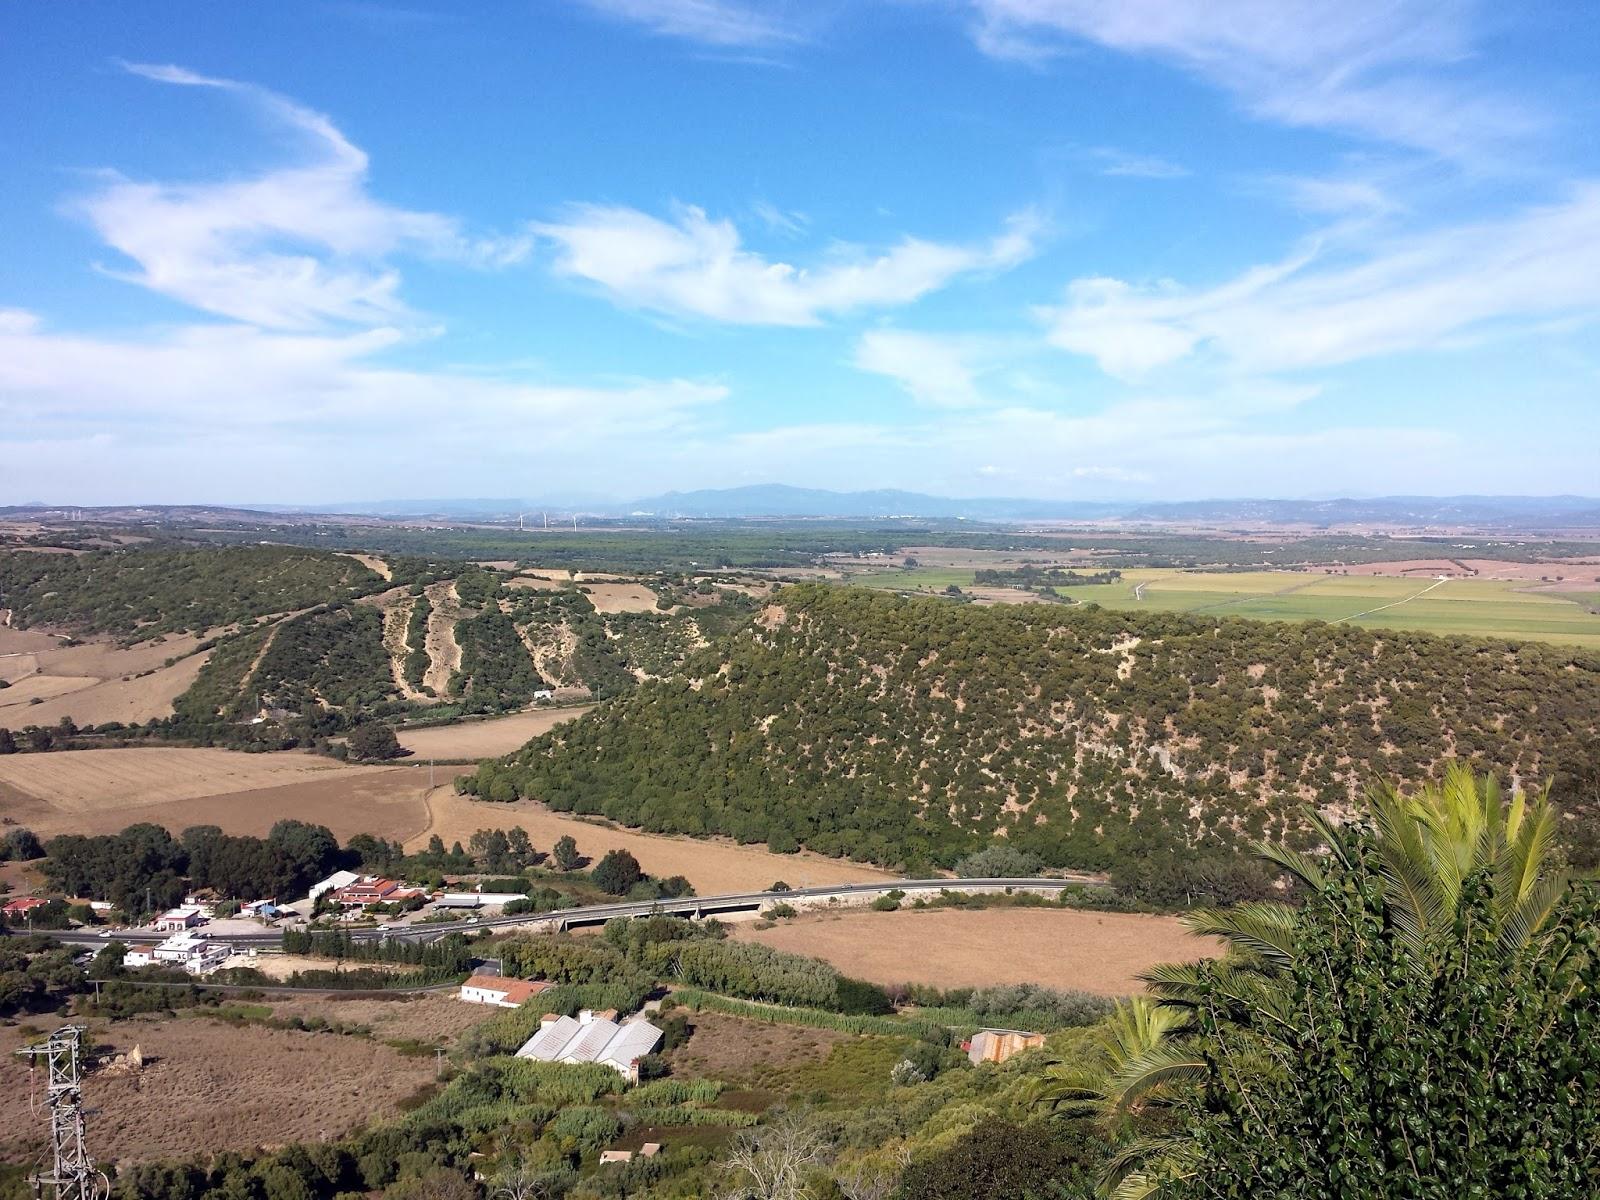 View from Vejer de la Frontera  |  Postcard from Andalucía: Vejer de la Frontera on afeathery*nest  |  http://afeatherynest.com